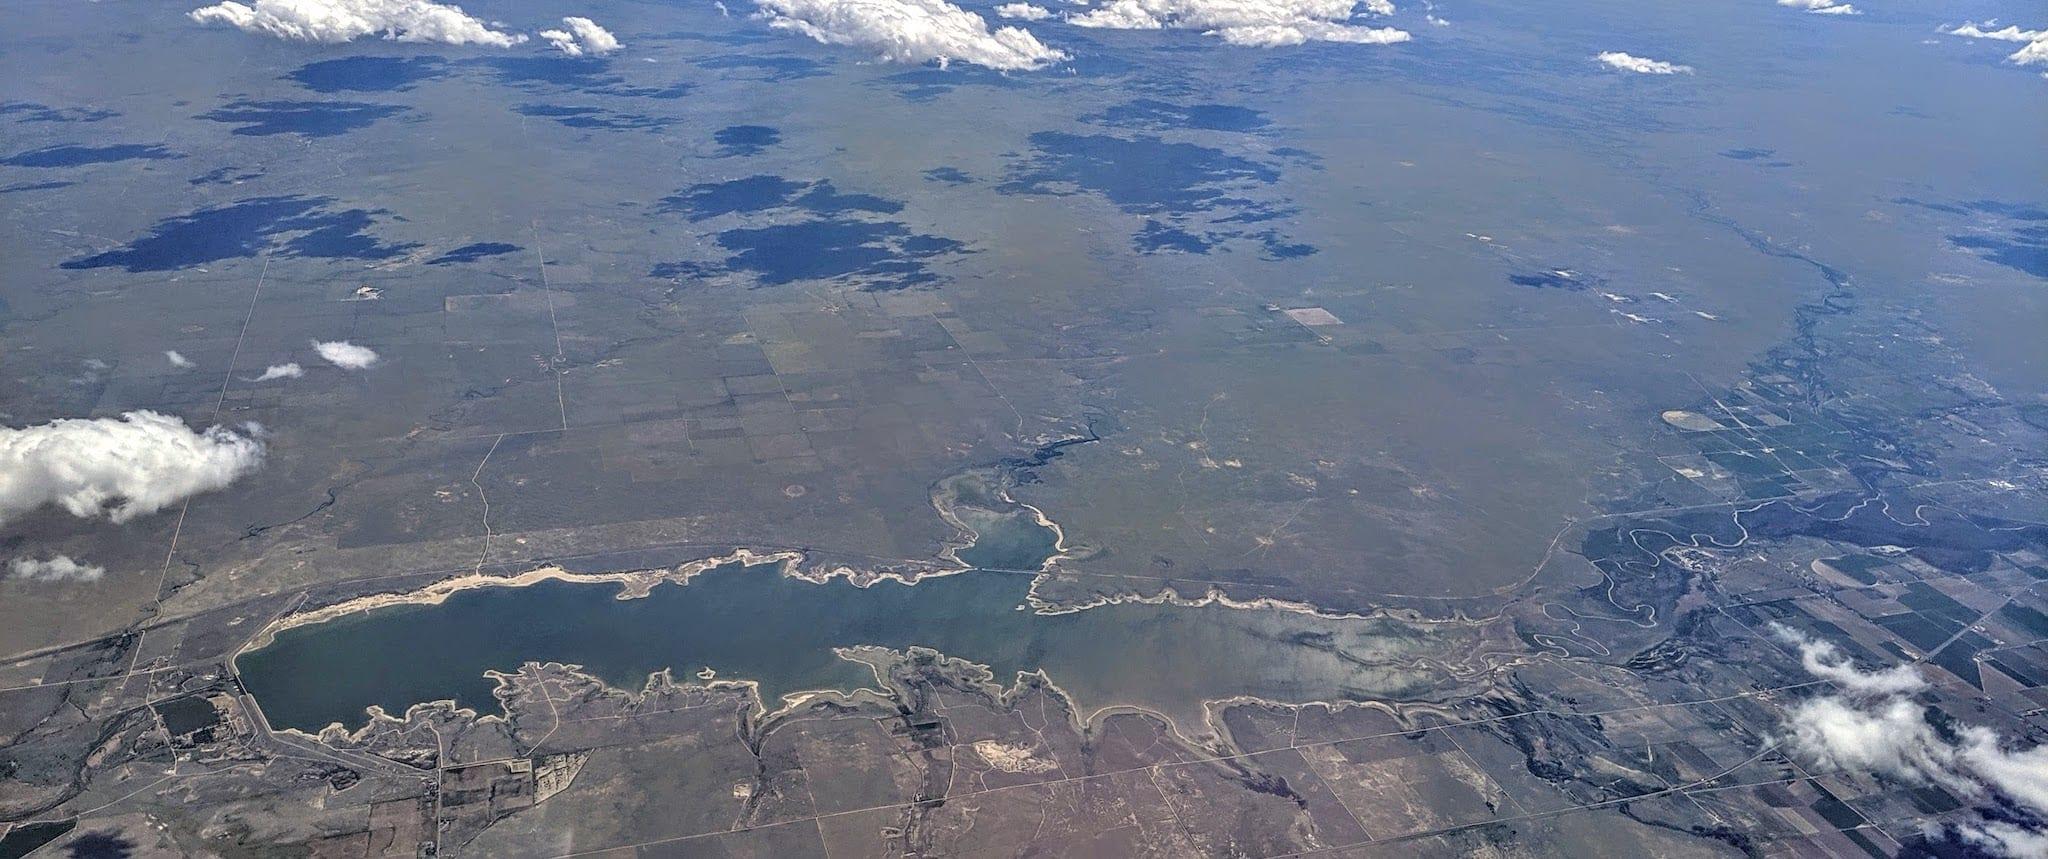 John Martin Reservoir Colorado Aerial View